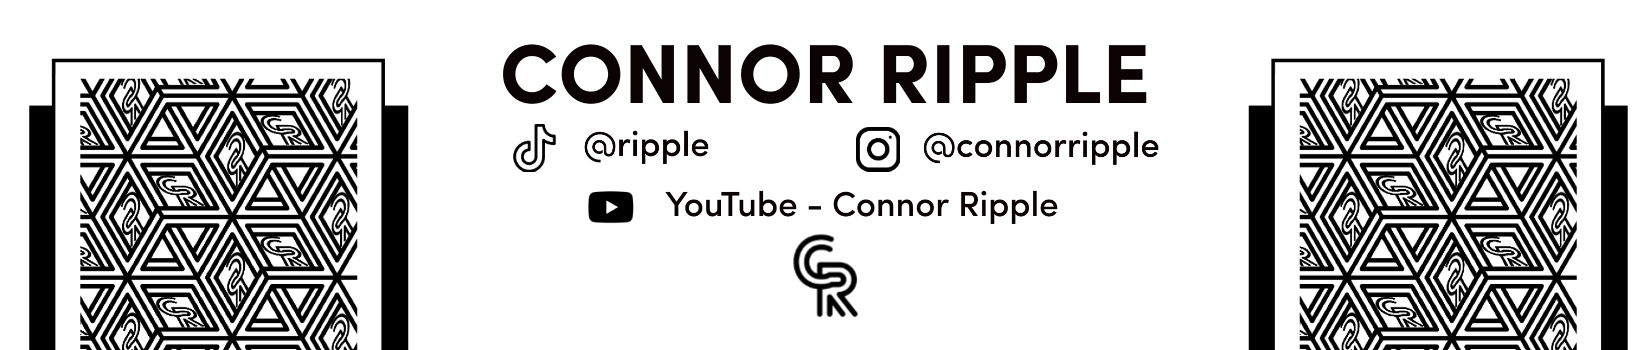 CONNOR RIPPLE